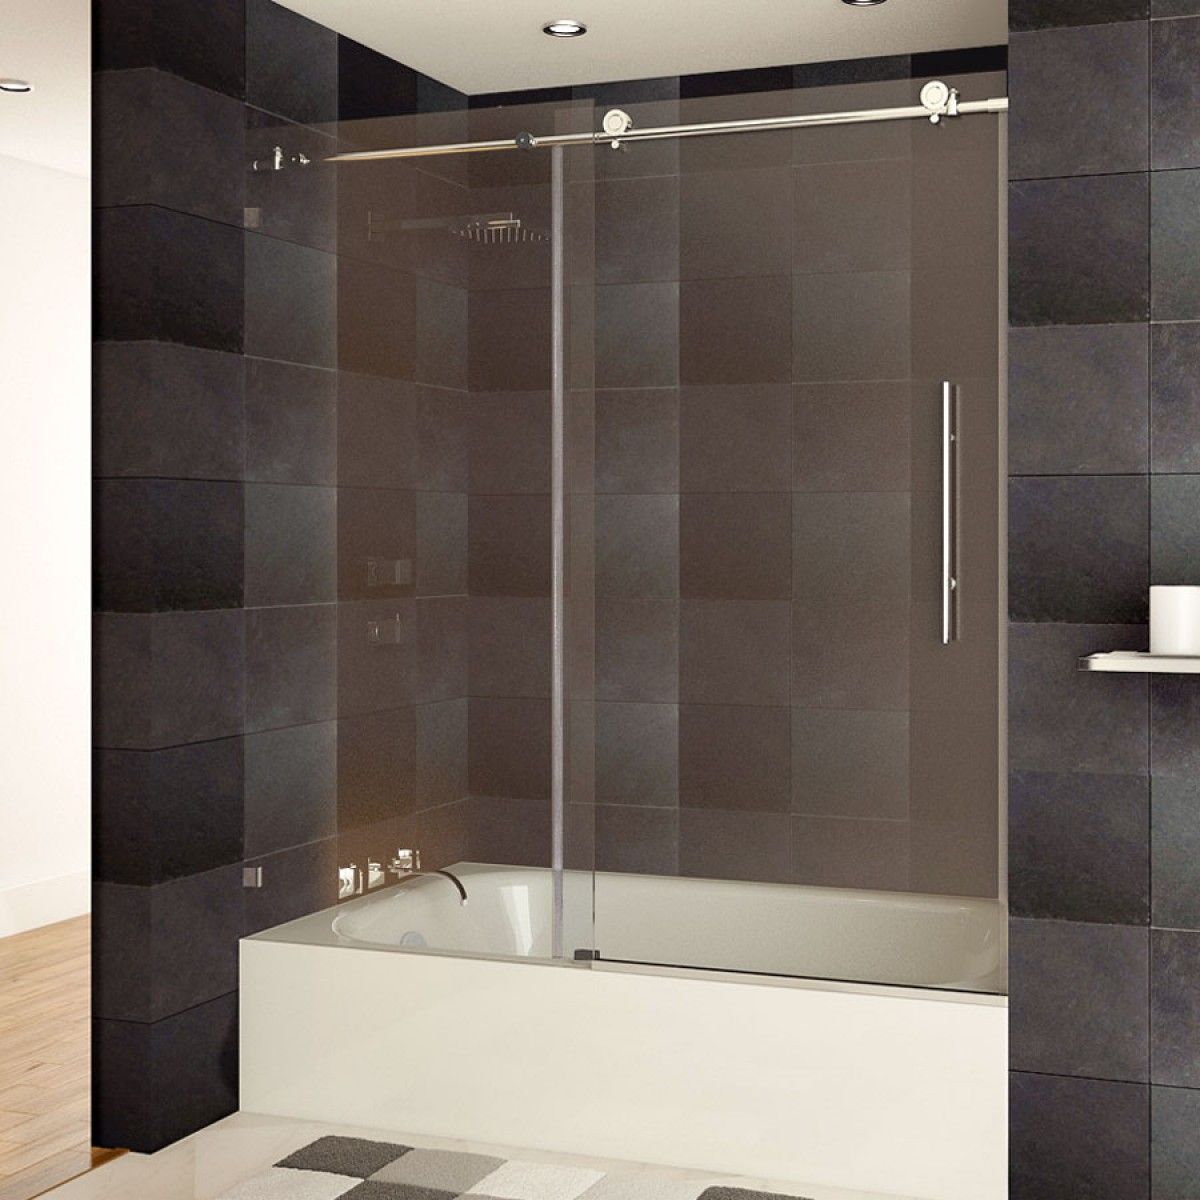 Ultra C 60 X 62 Bath Tub Door Chrome Finish Shower Doors